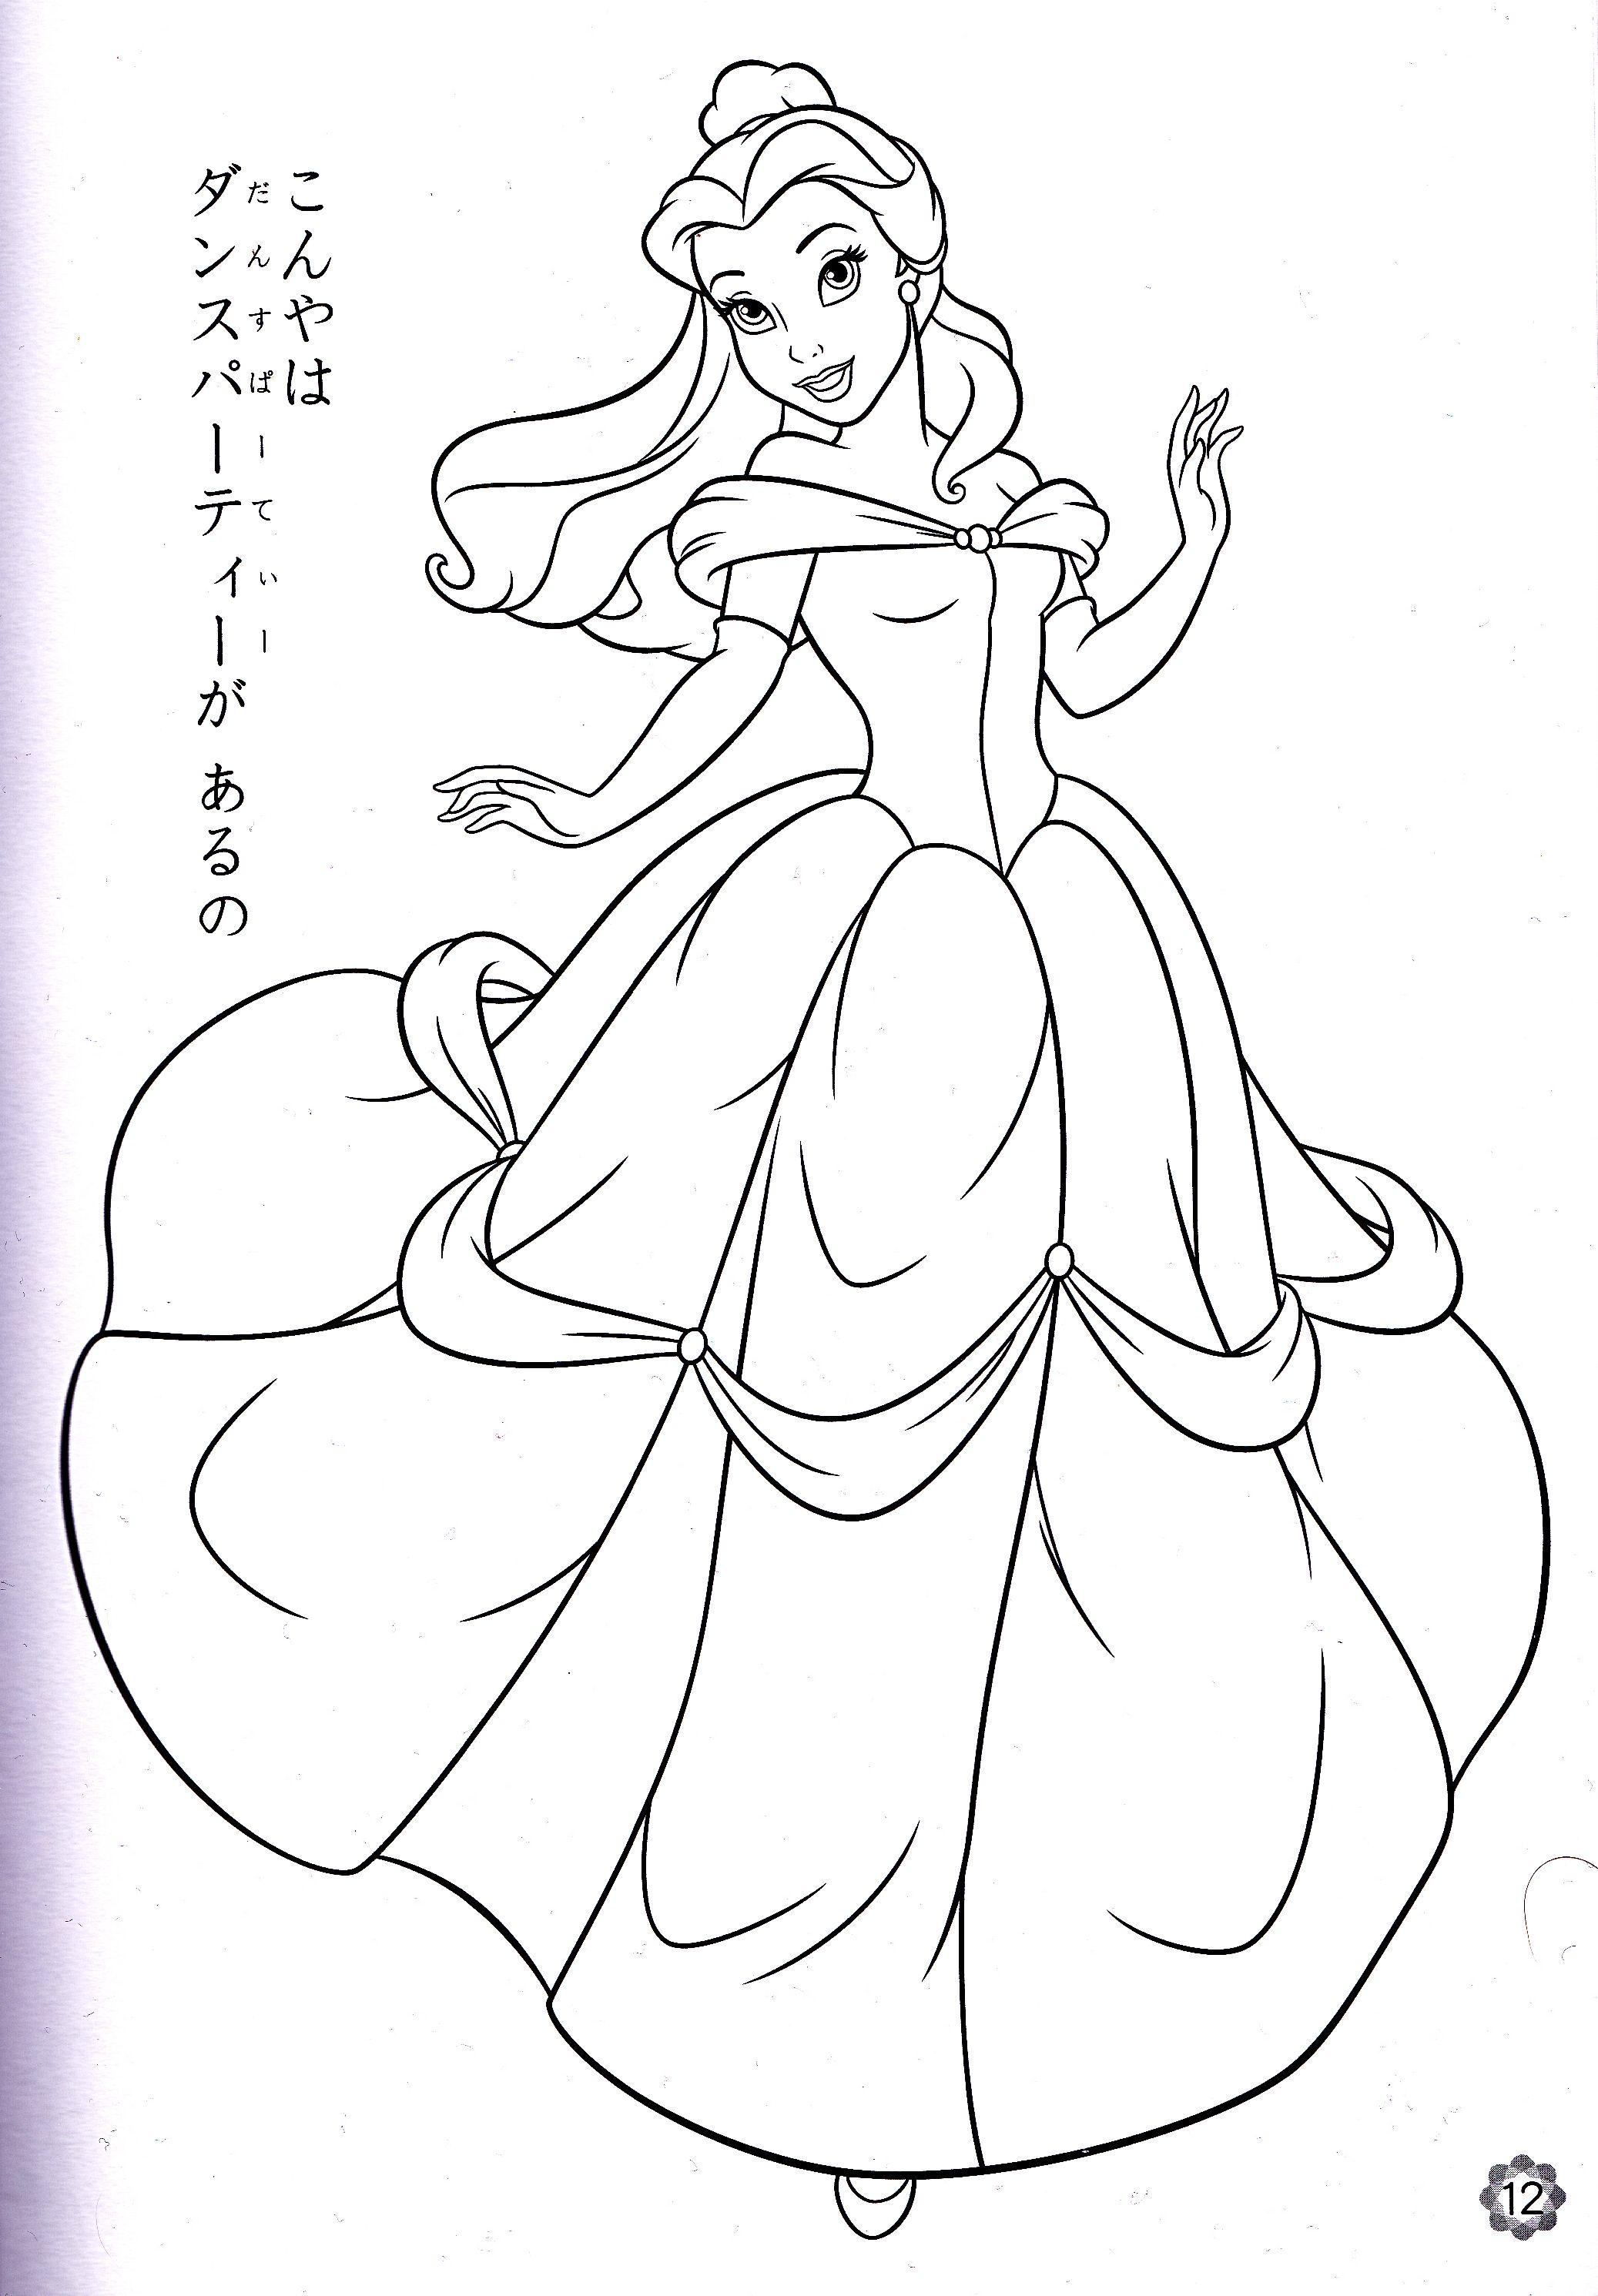 Walt Disney Coloring Pages Princess Belle Disney Princess